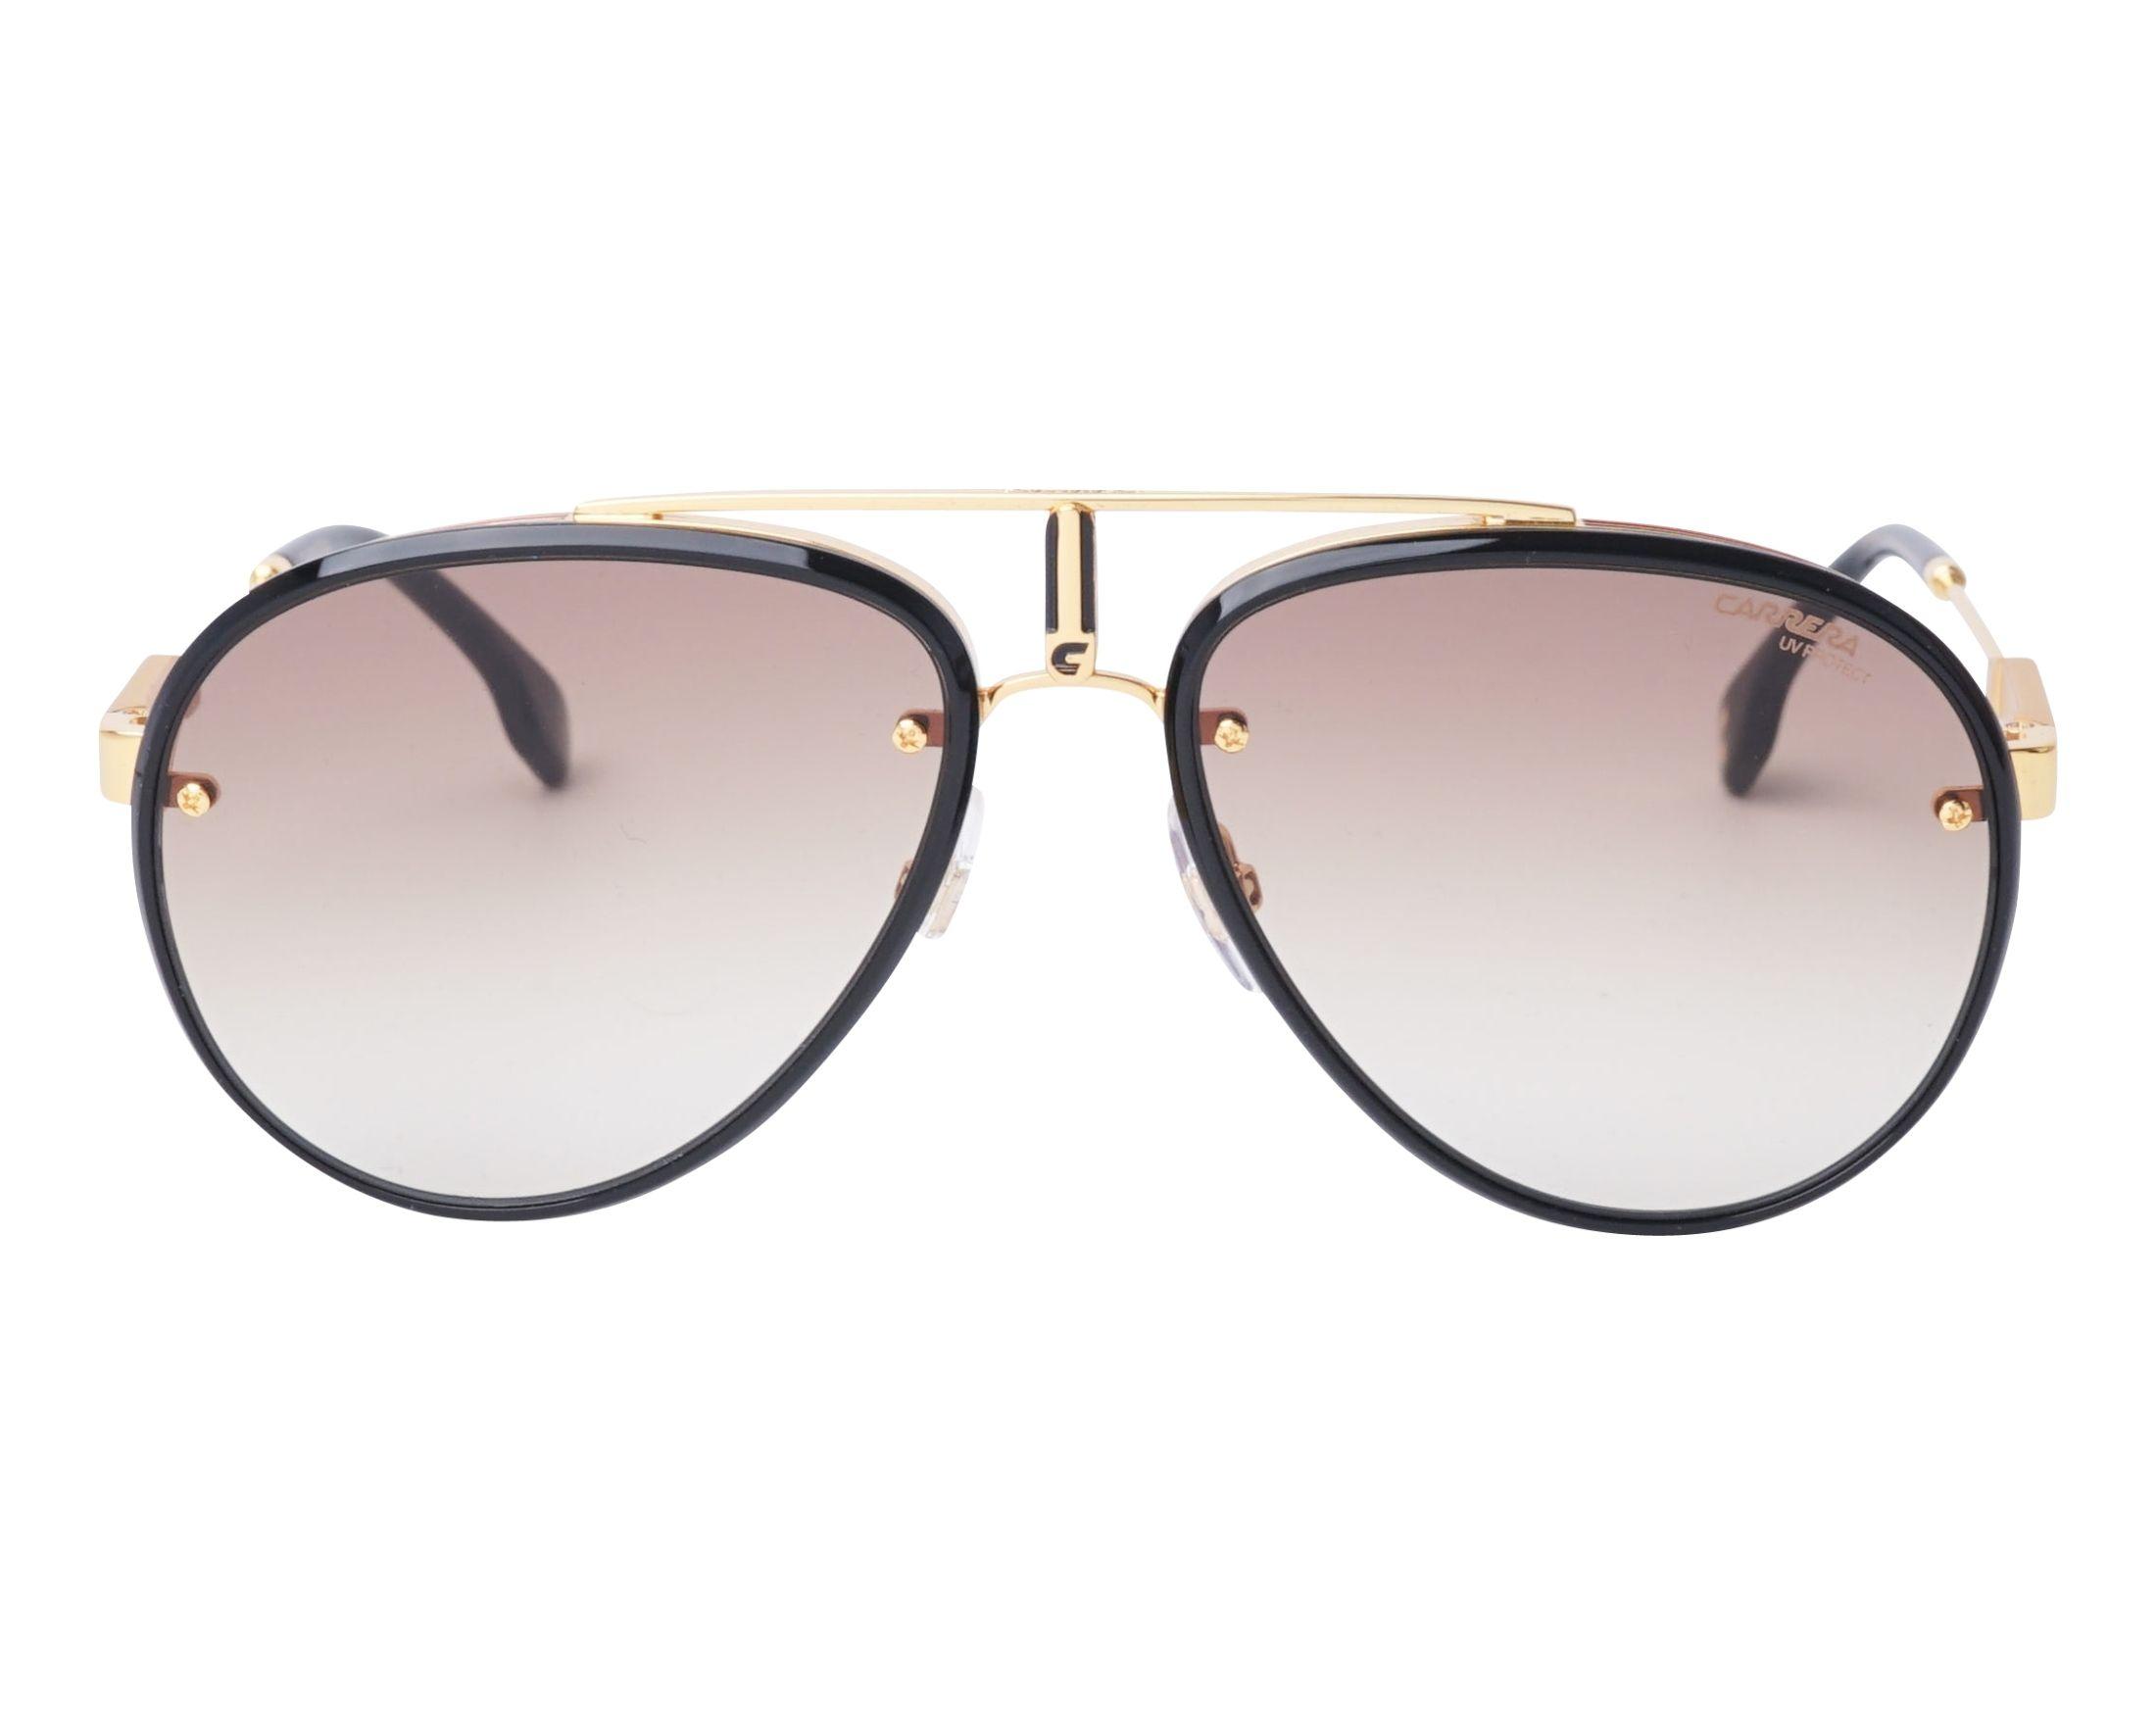 Carrera Eyewear Sonnenbrille » CARRERA GLORY«, schwarz, 003/2K - schwarz/grau